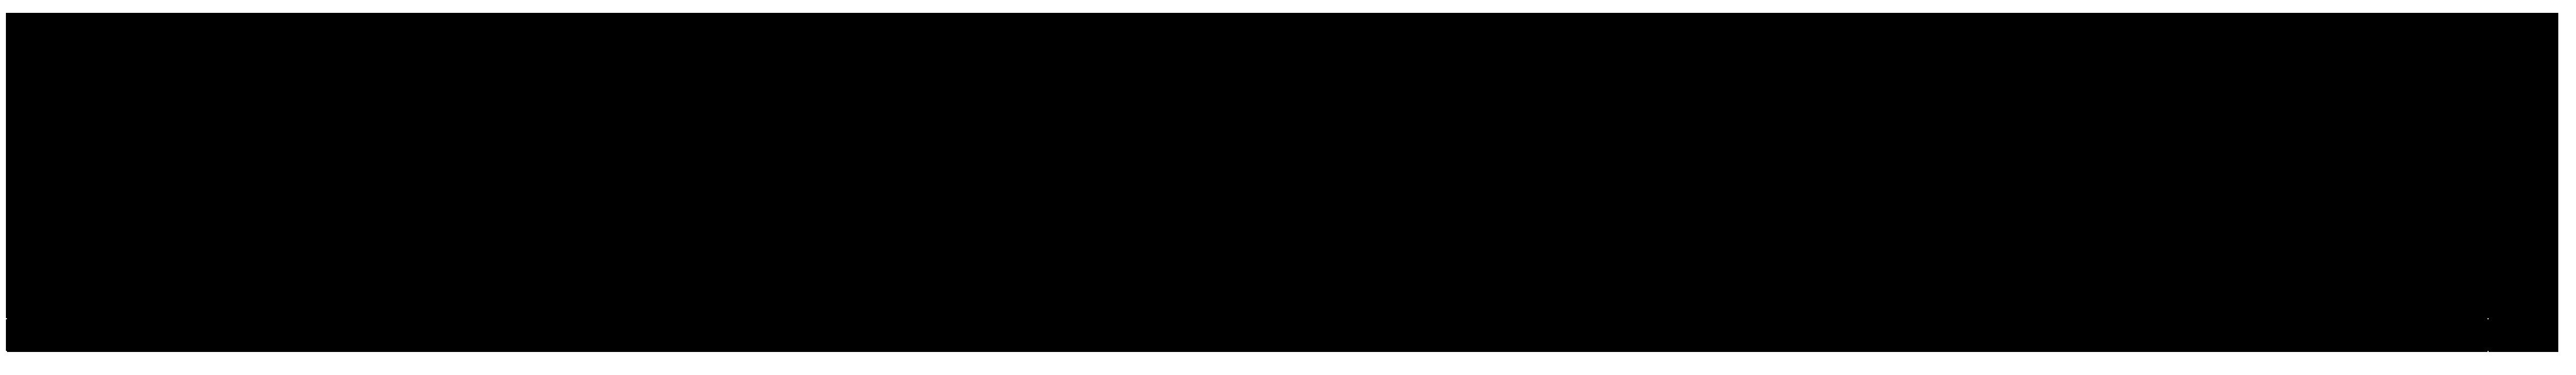 AH_erosboldlogo1 with r registration mark